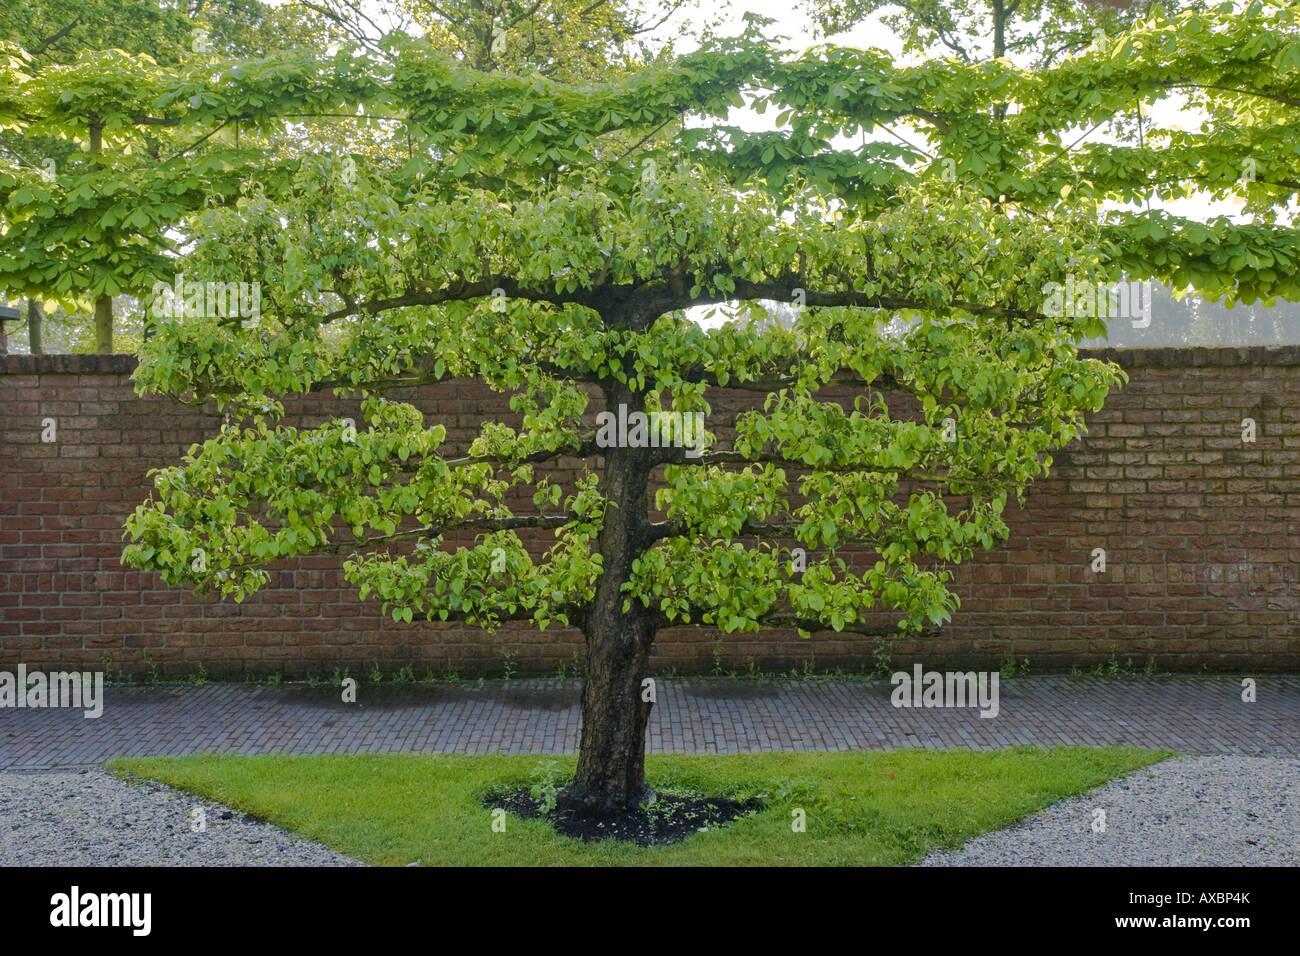 Espalier Fruit Tree In A Garden Netherlands Northern Netherlands